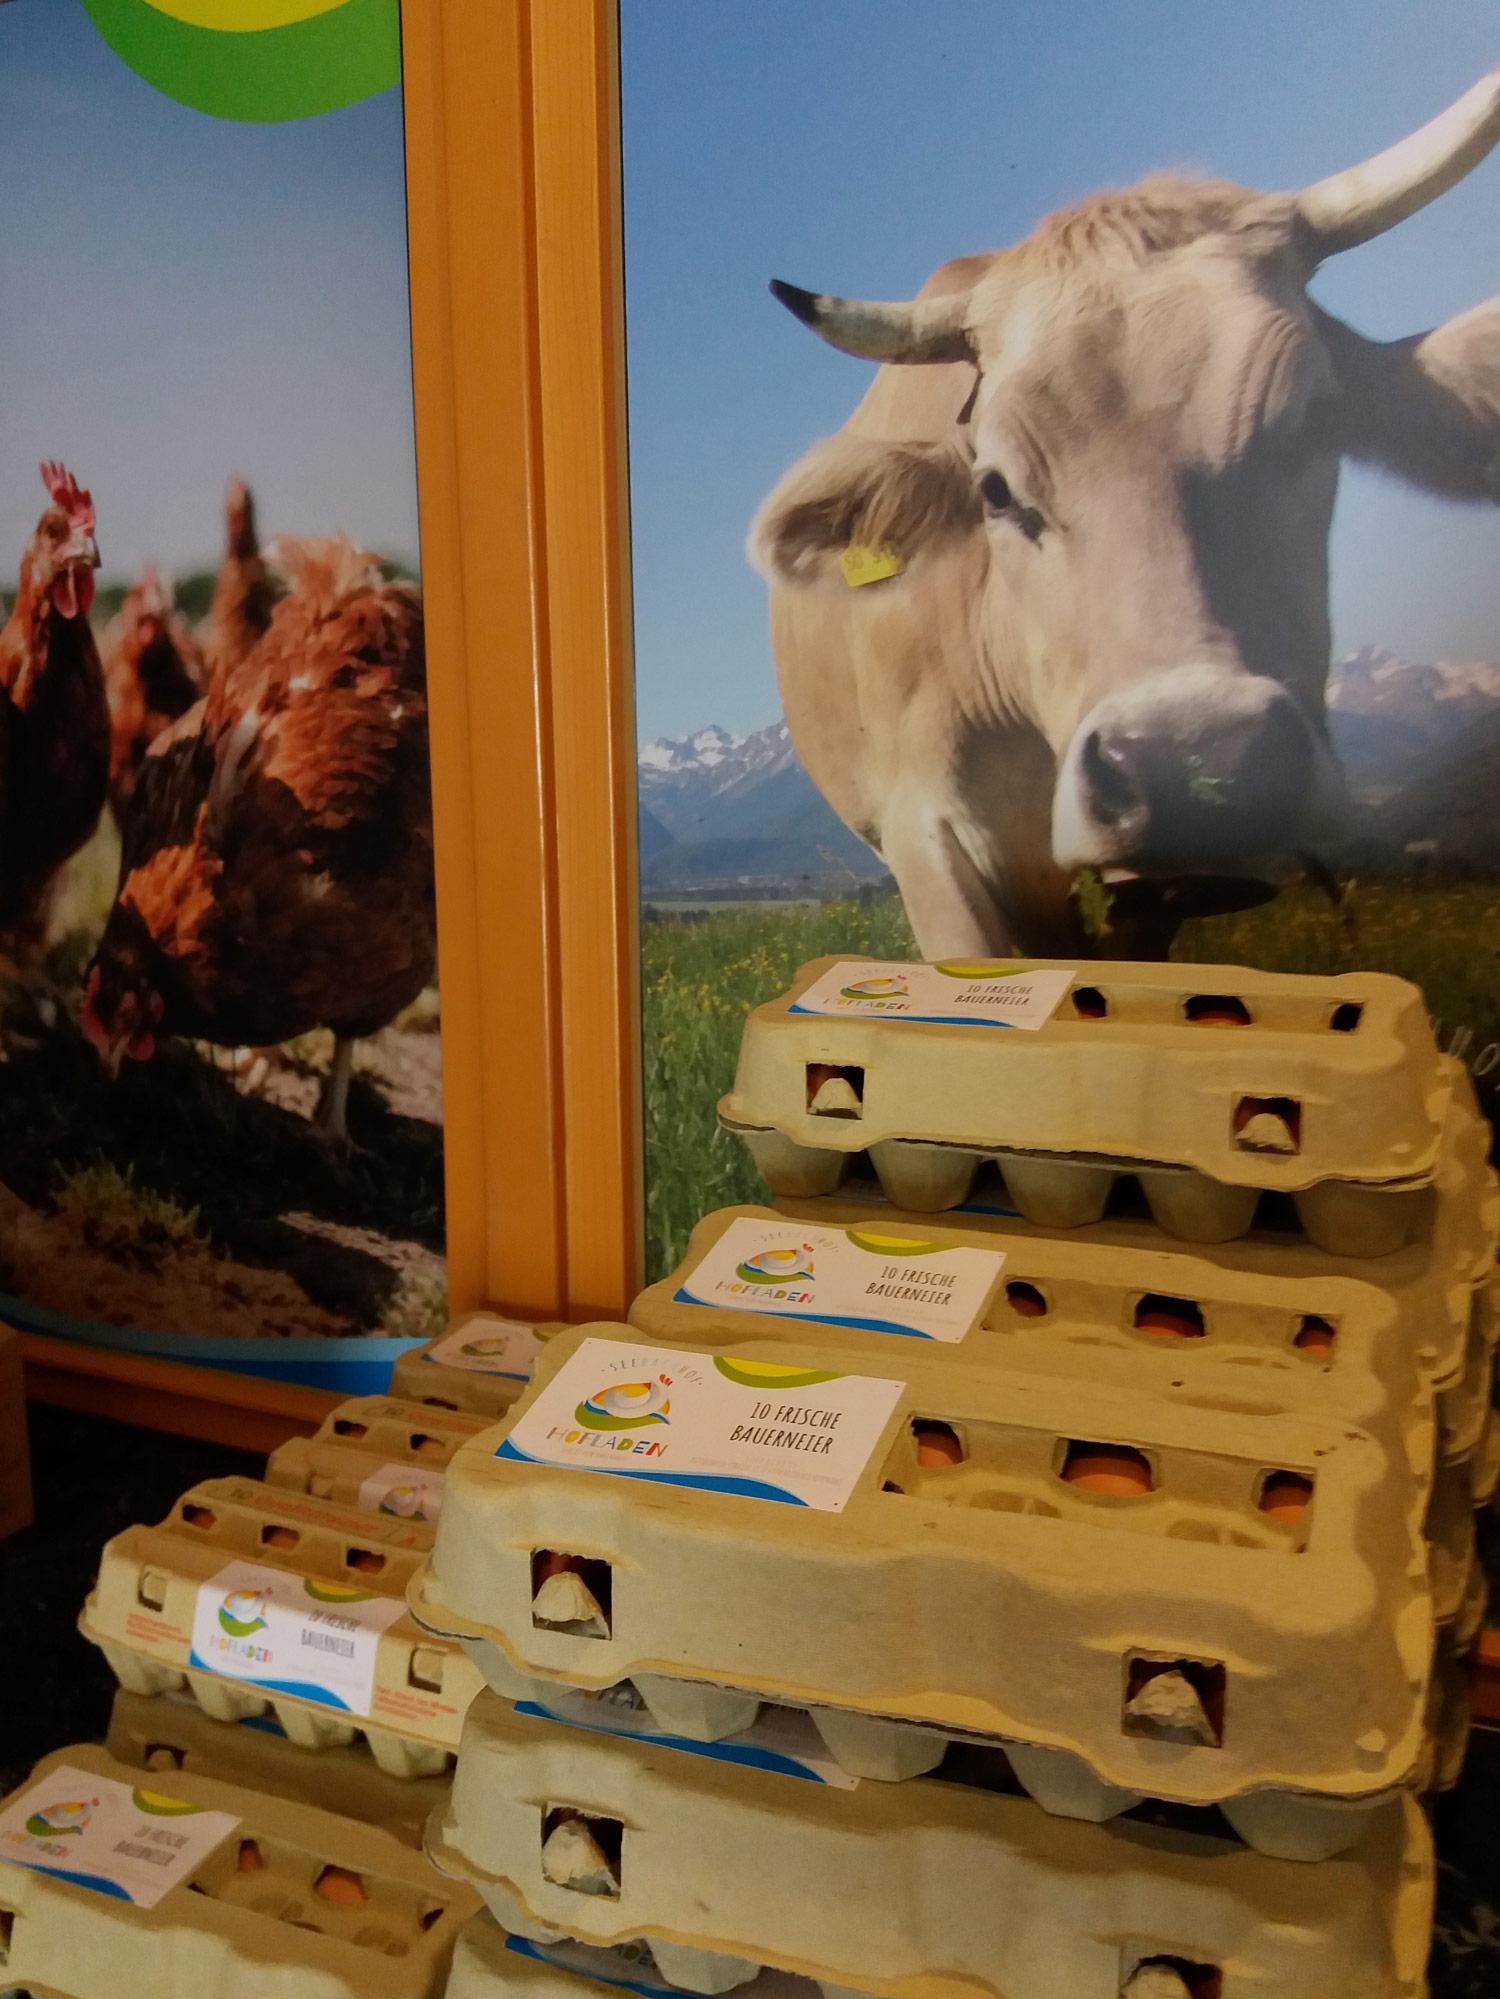 Seebach Hofladen Kitzbühel - Eier Käse Fleisch Gemüse Lebensmittel Kirchberg